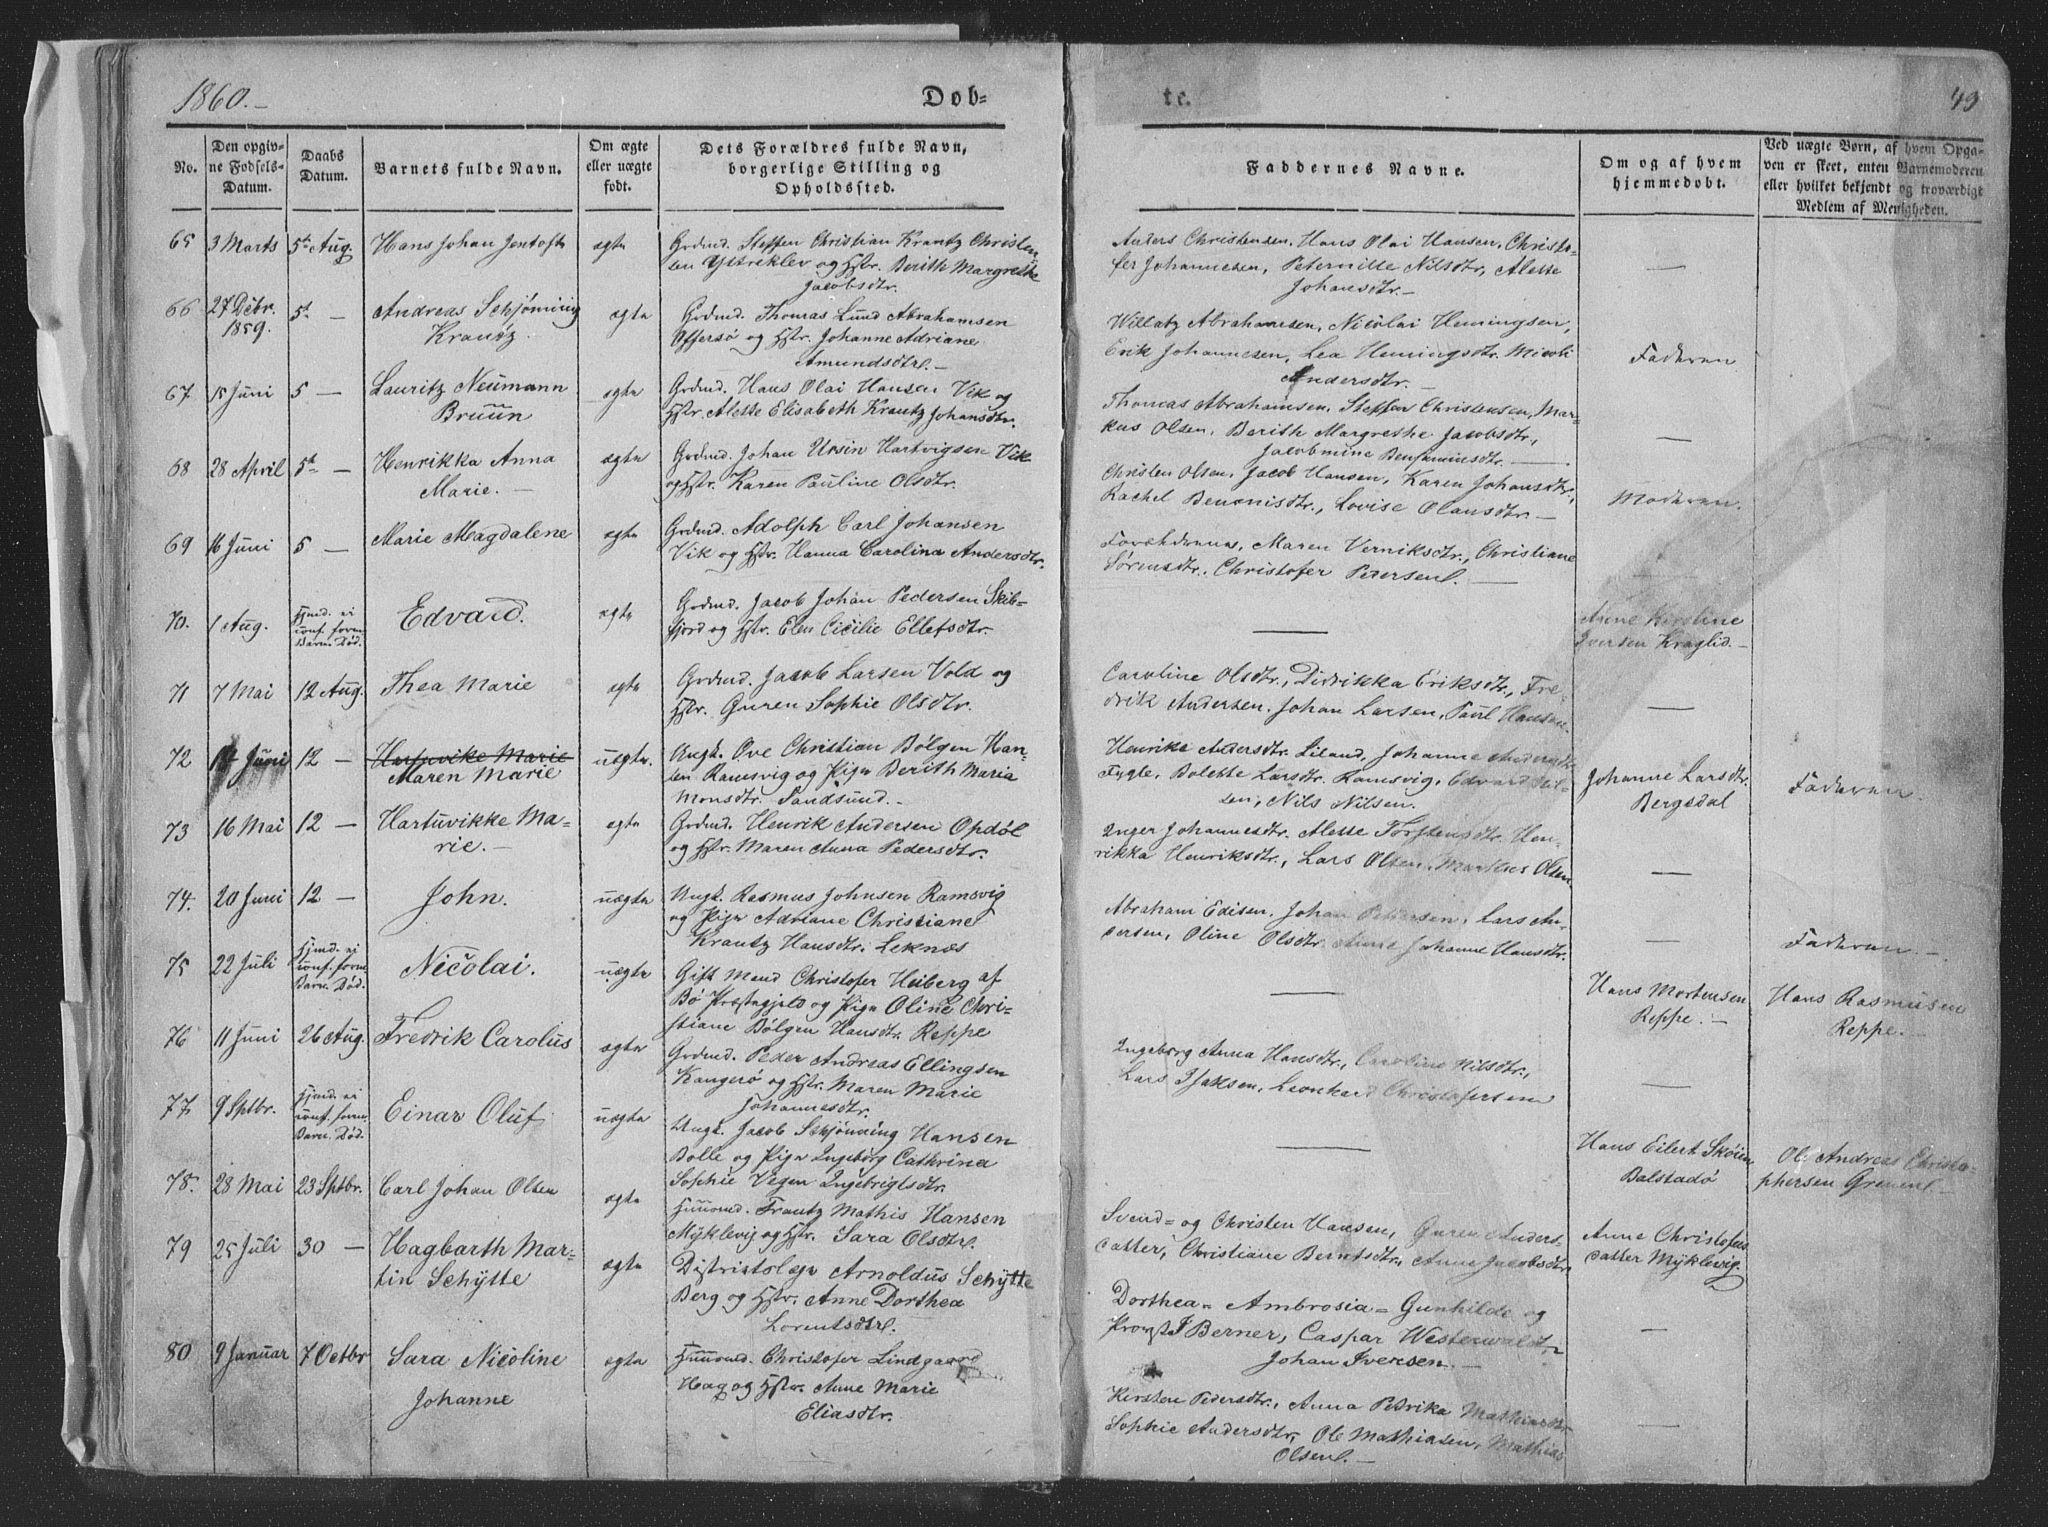 SAT, Ministerialprotokoller, klokkerbøker og fødselsregistre - Nordland, 881/L1165: Klokkerbok nr. 881C02, 1854-1876, s. 49